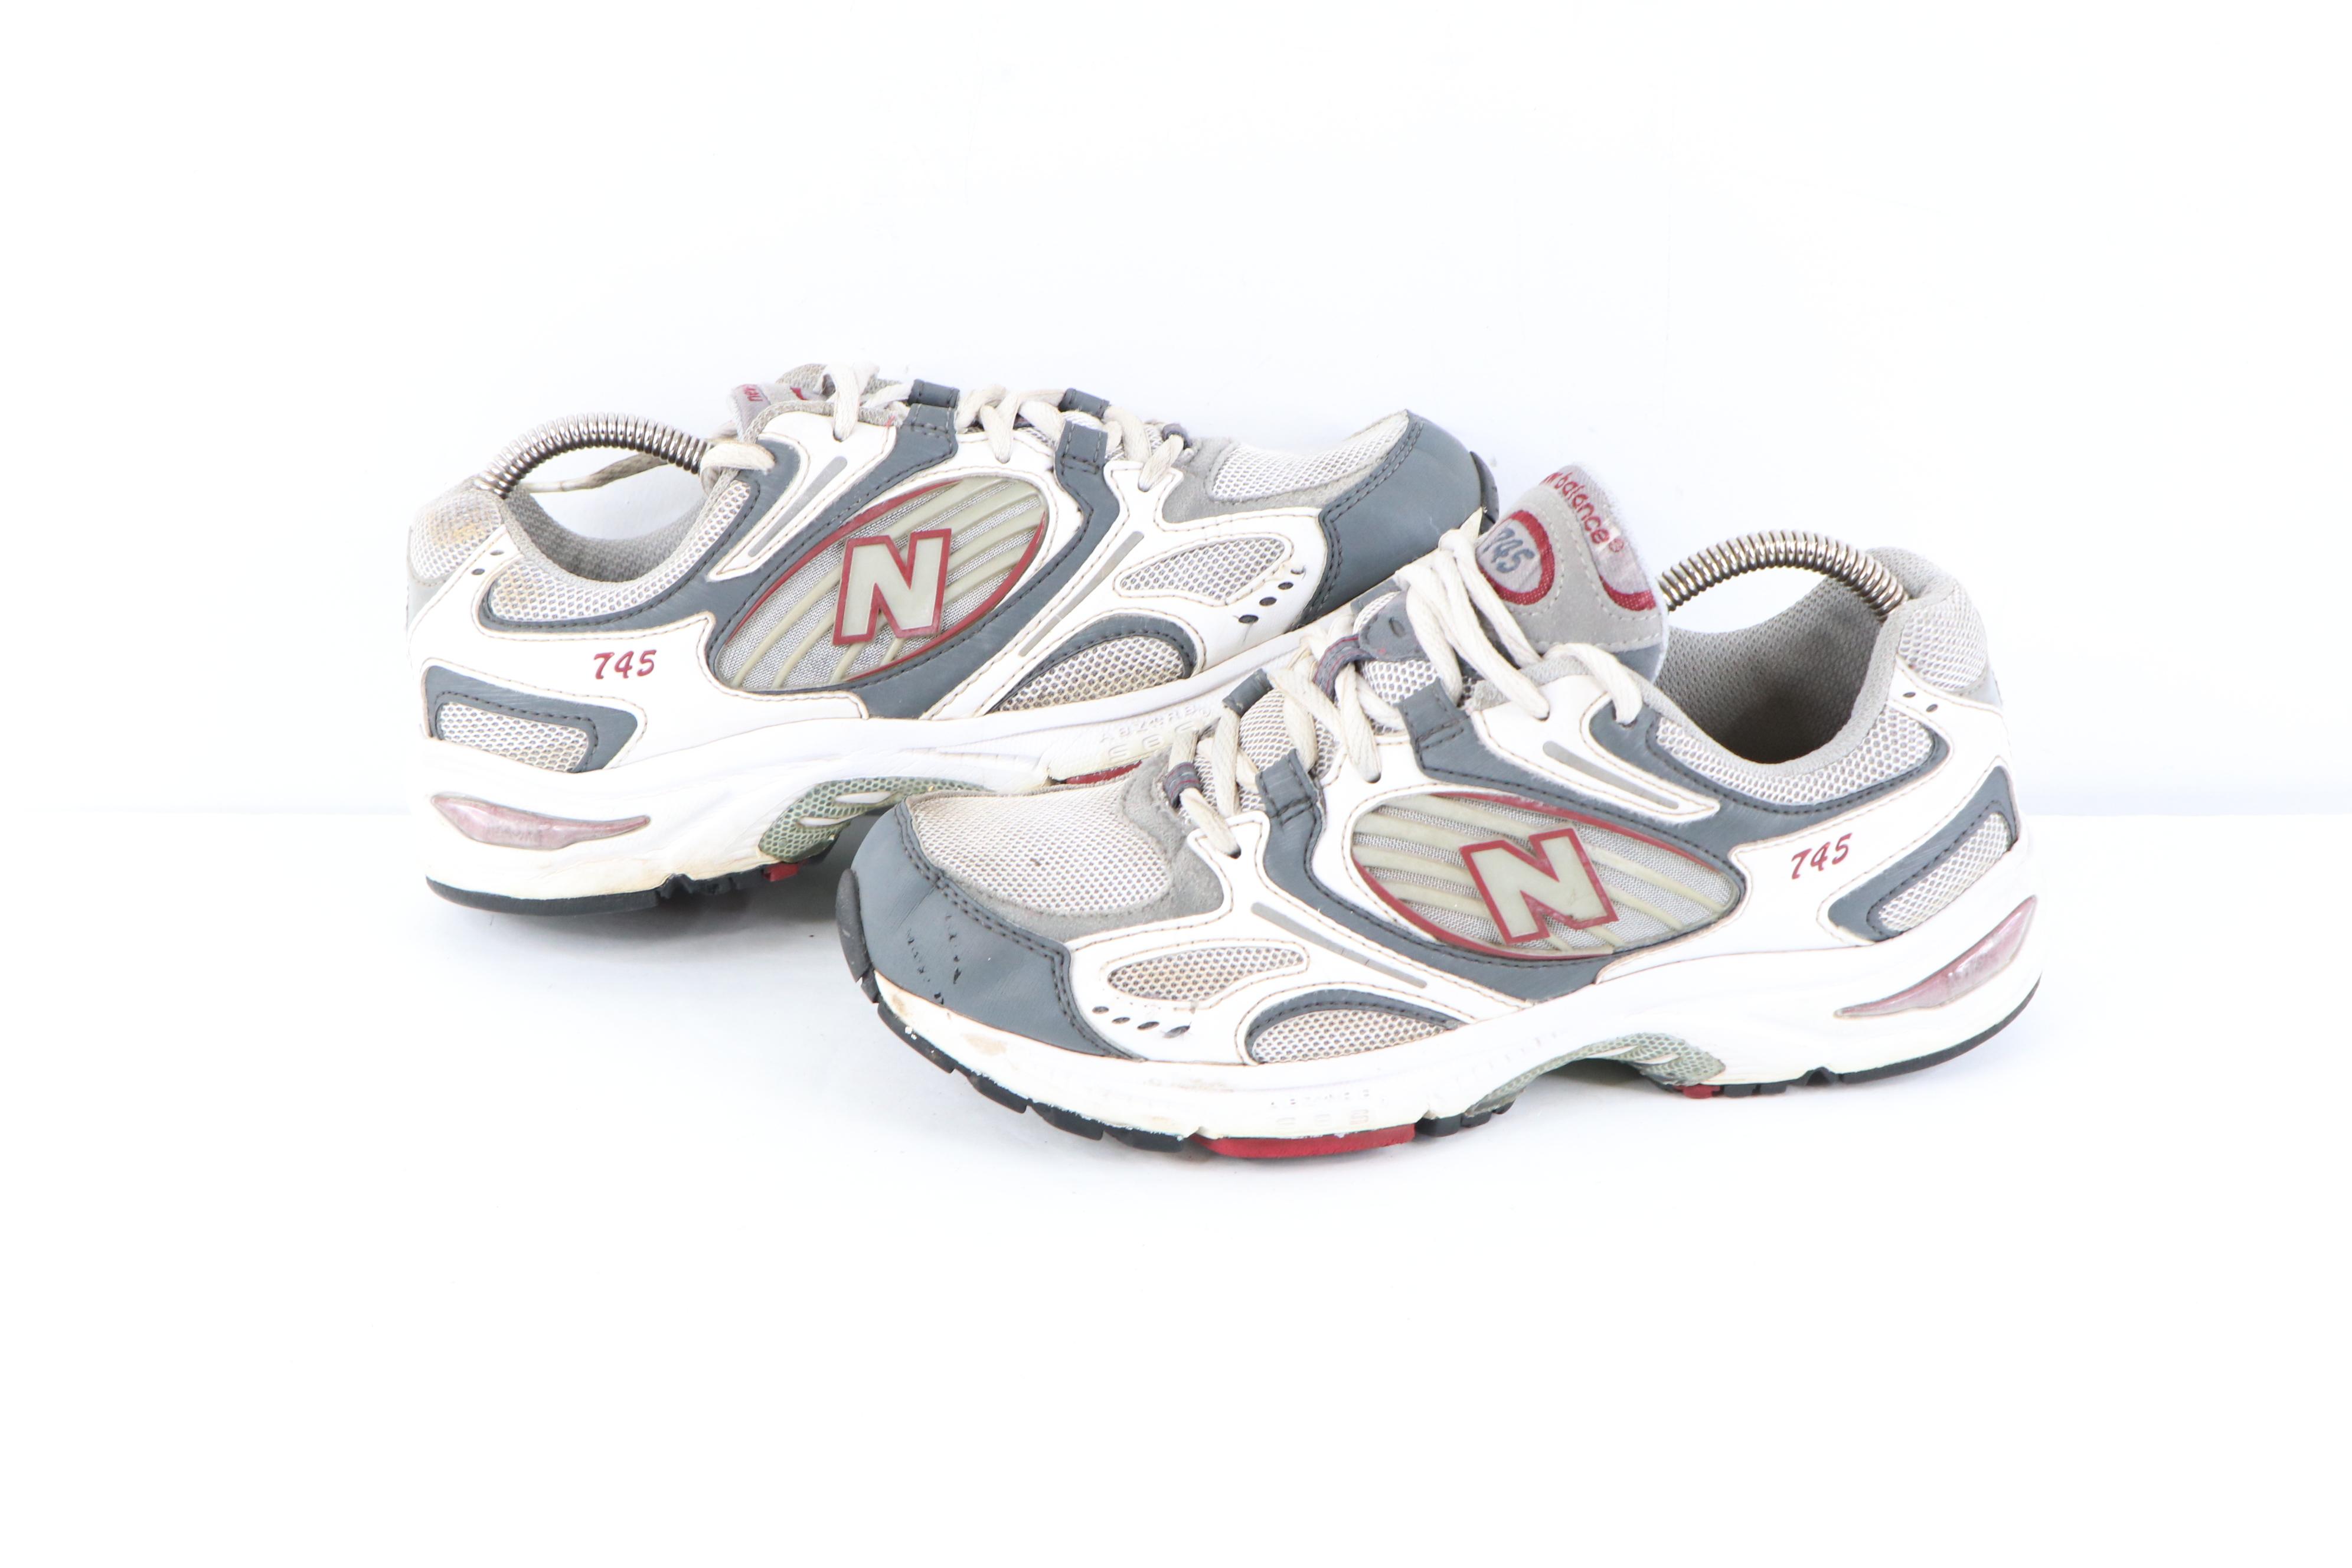 New Balance Vintage New Balance 745 Distressed Running Dad Shoes USA